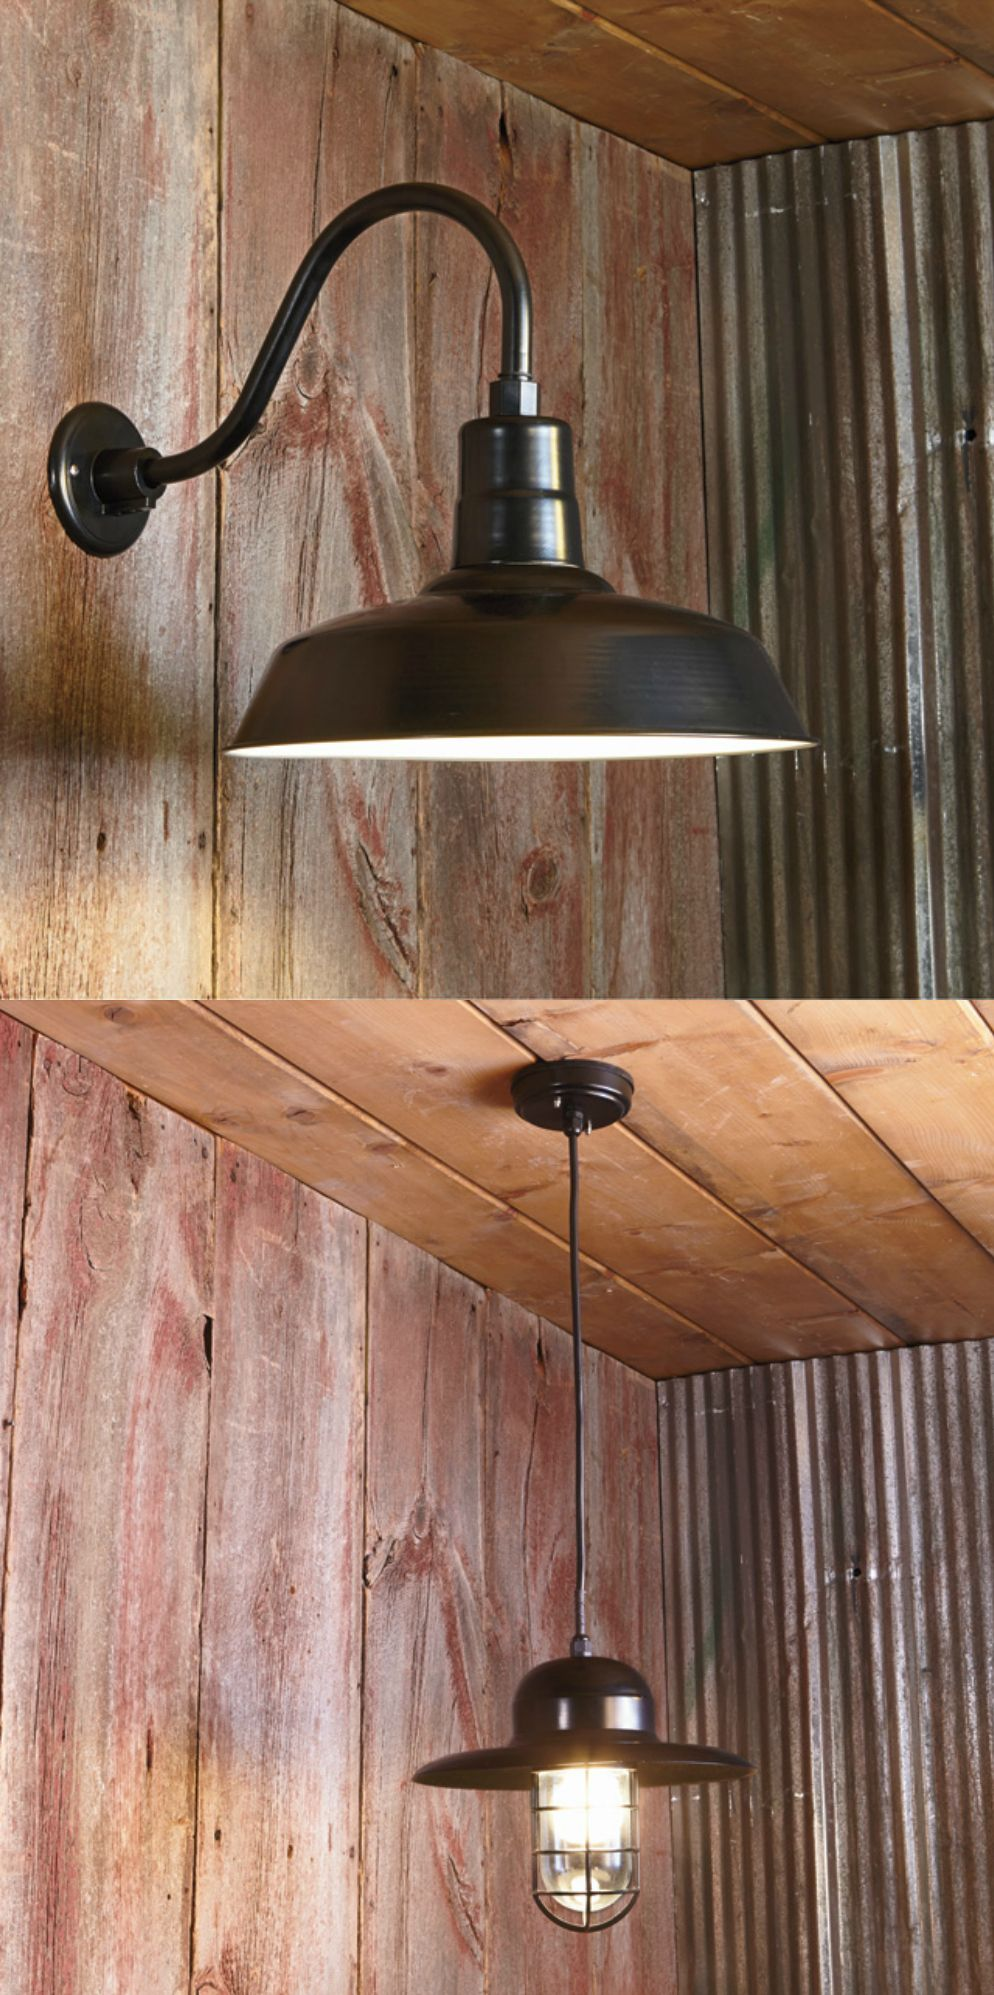 Affordable Barn Lights Add A Comfortable Farmhouse Feel Multiple